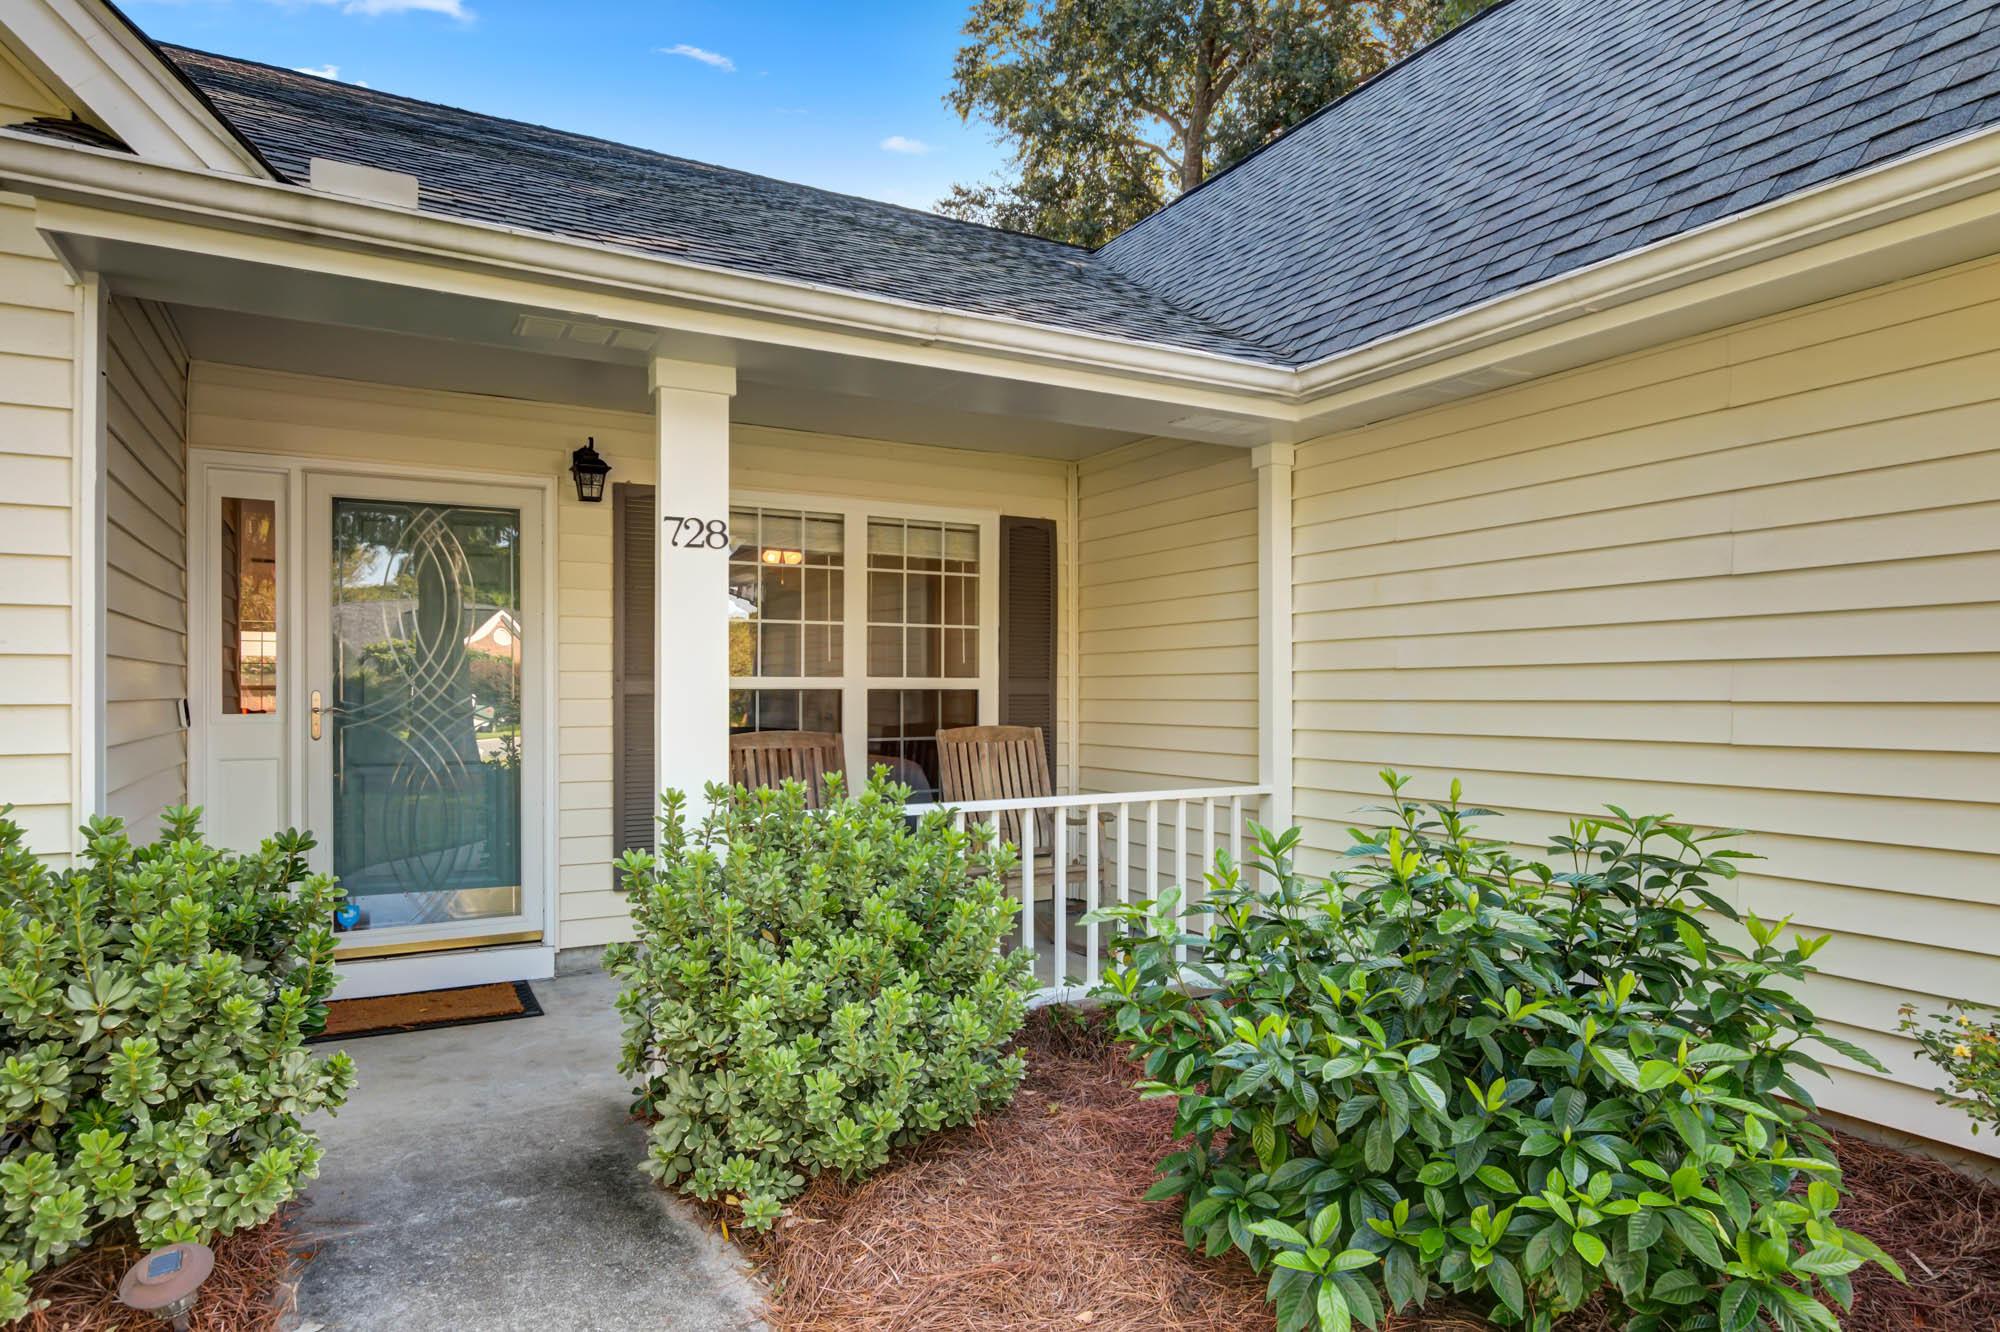 Glen Lake Homes For Sale - 728 Veron, Mount Pleasant, SC - 21